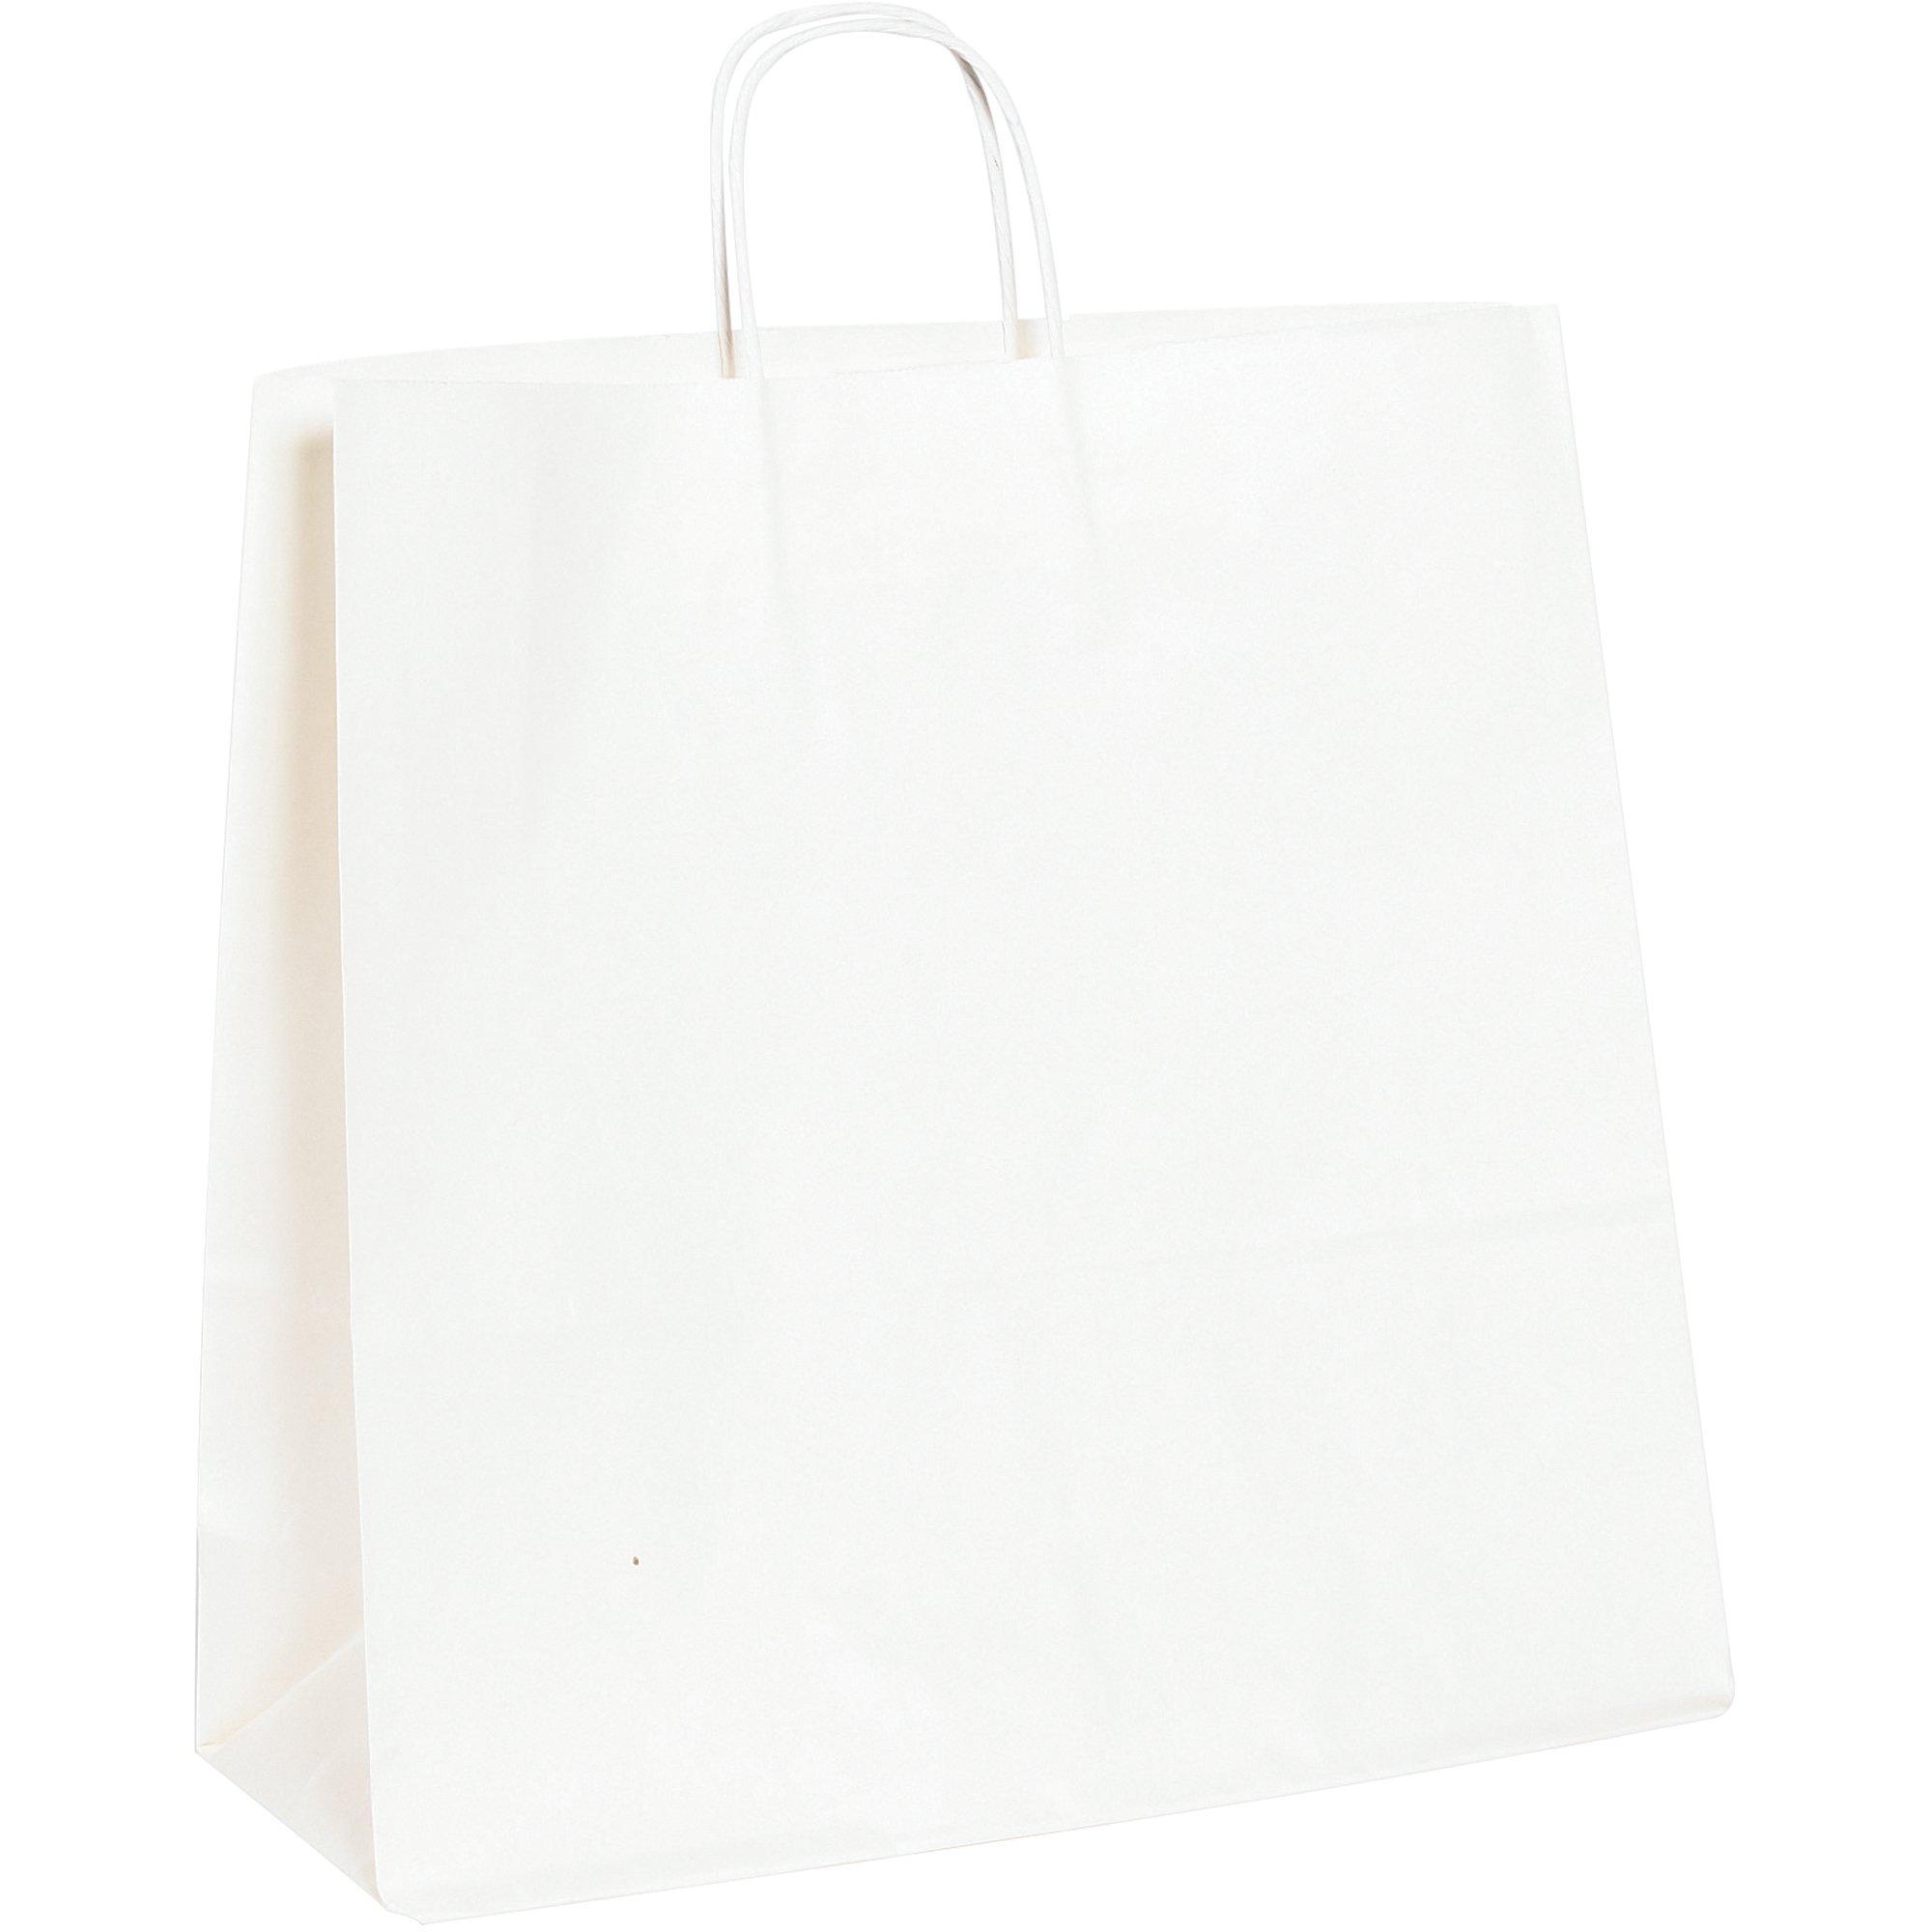 Paper Shopping Bags, 16'' x 6'' x 15 3/4'', White, 200/Case